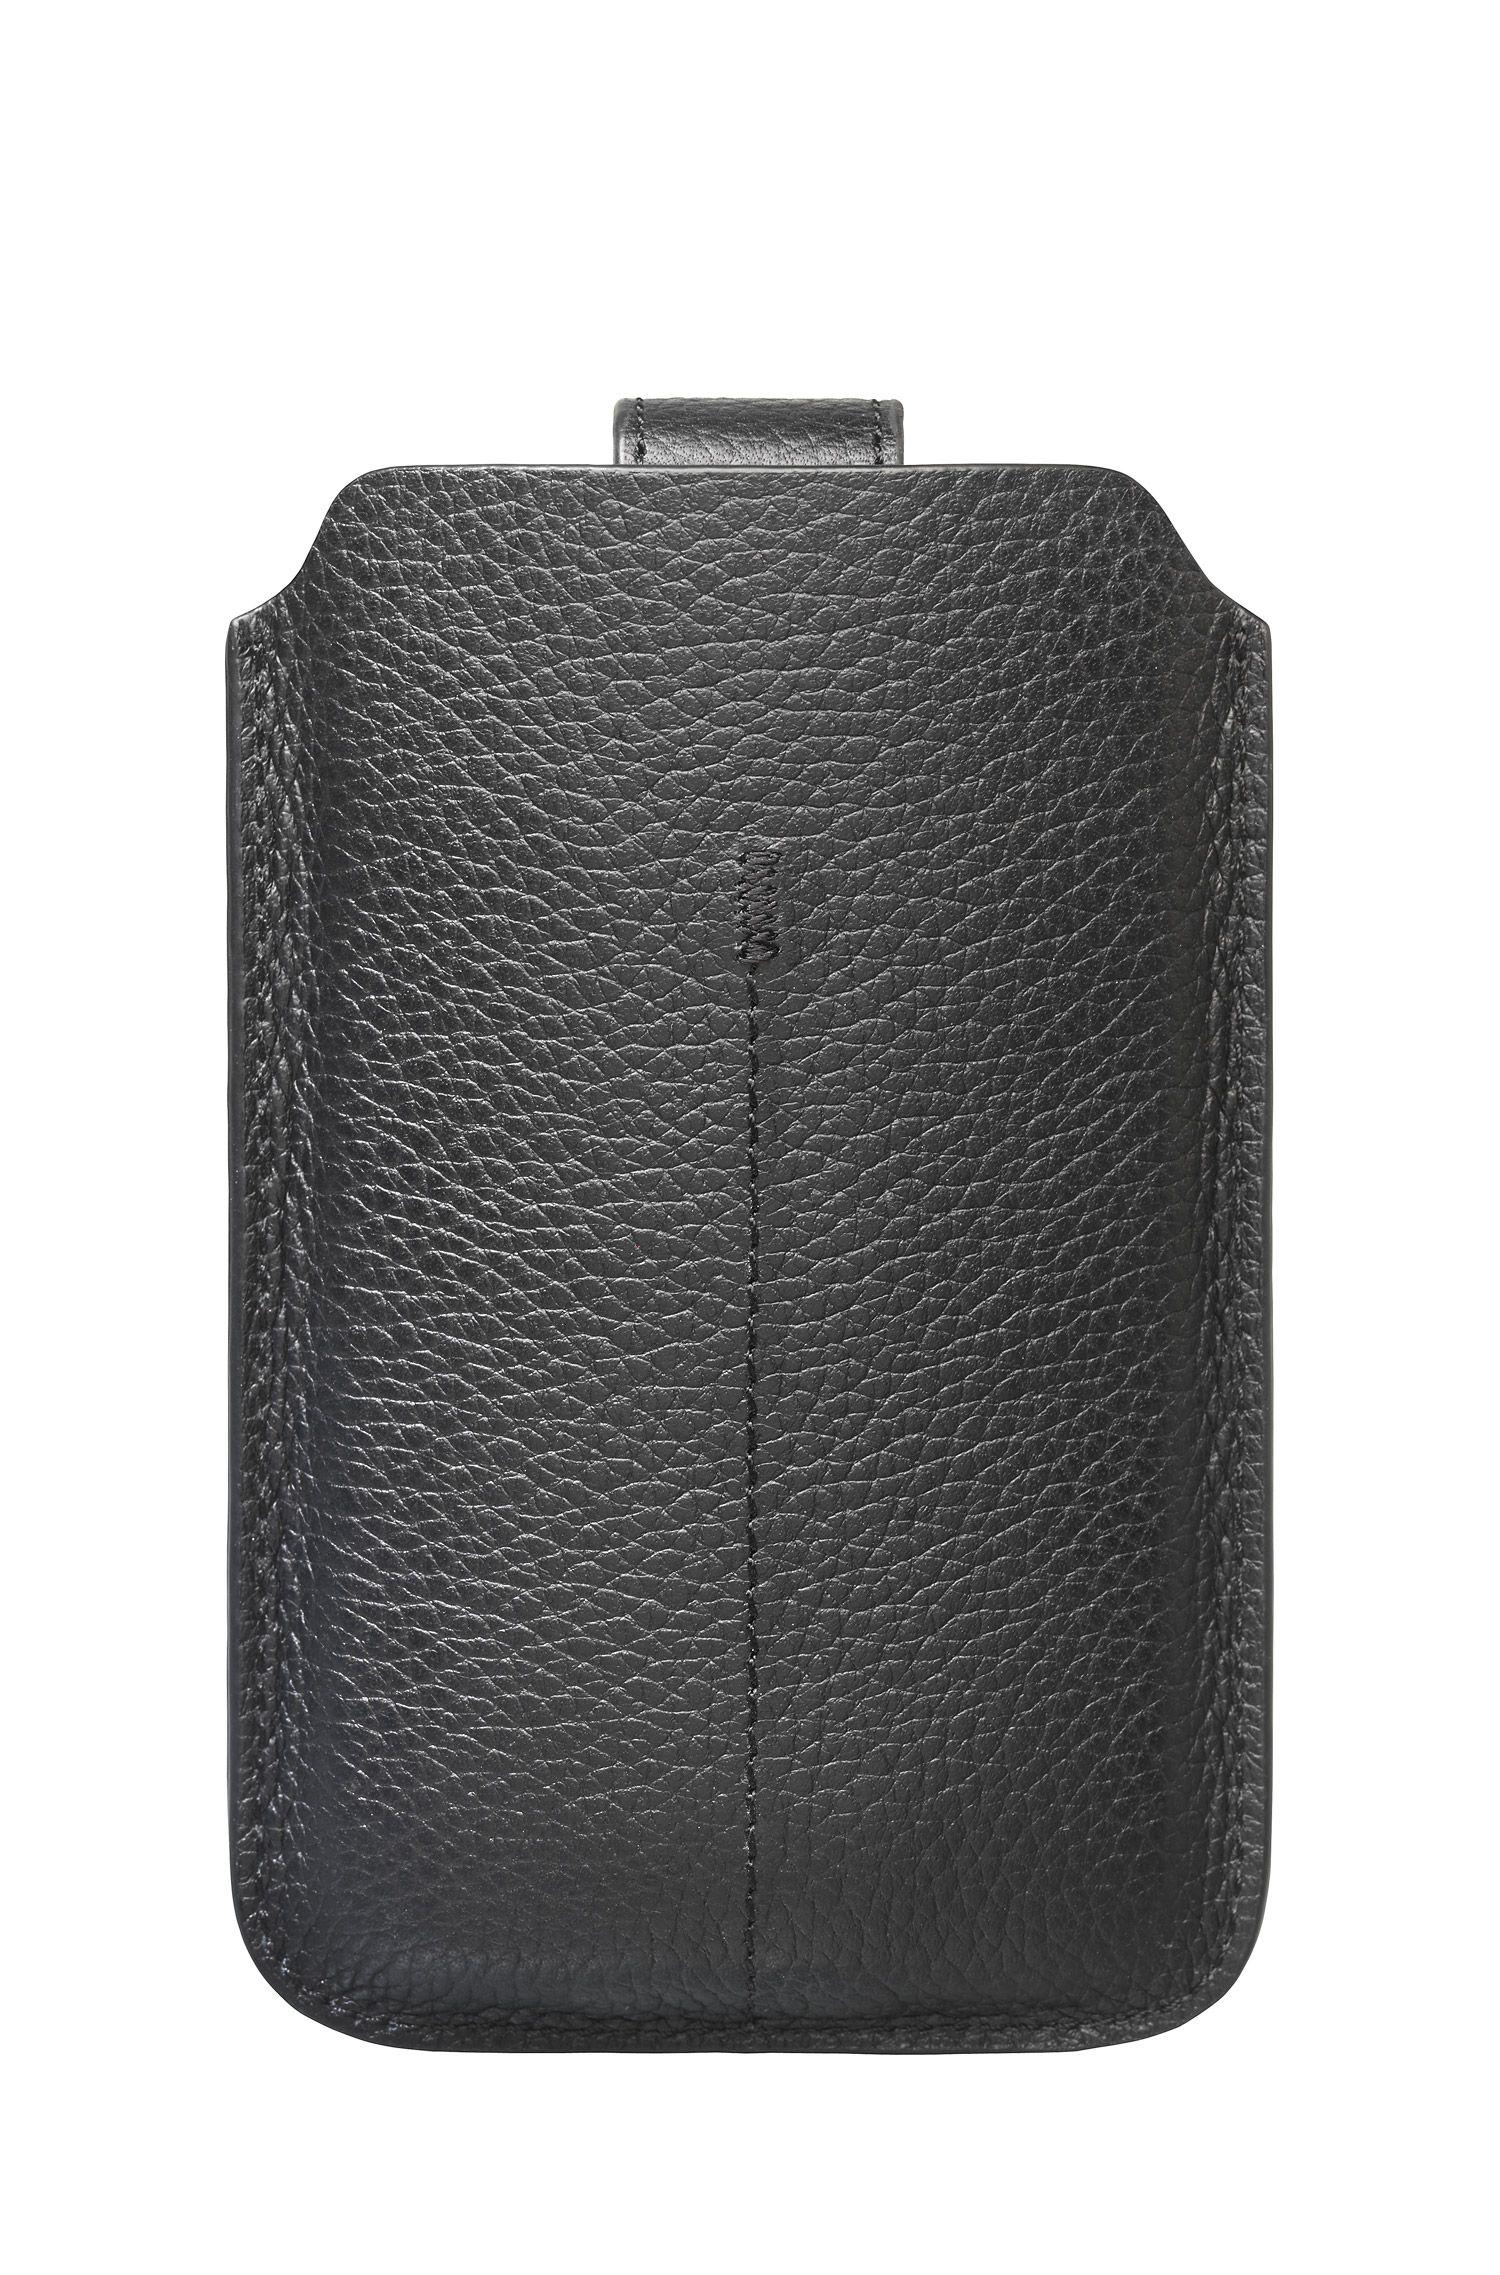 Universaltasche ´BARCELONA` für Smartphones